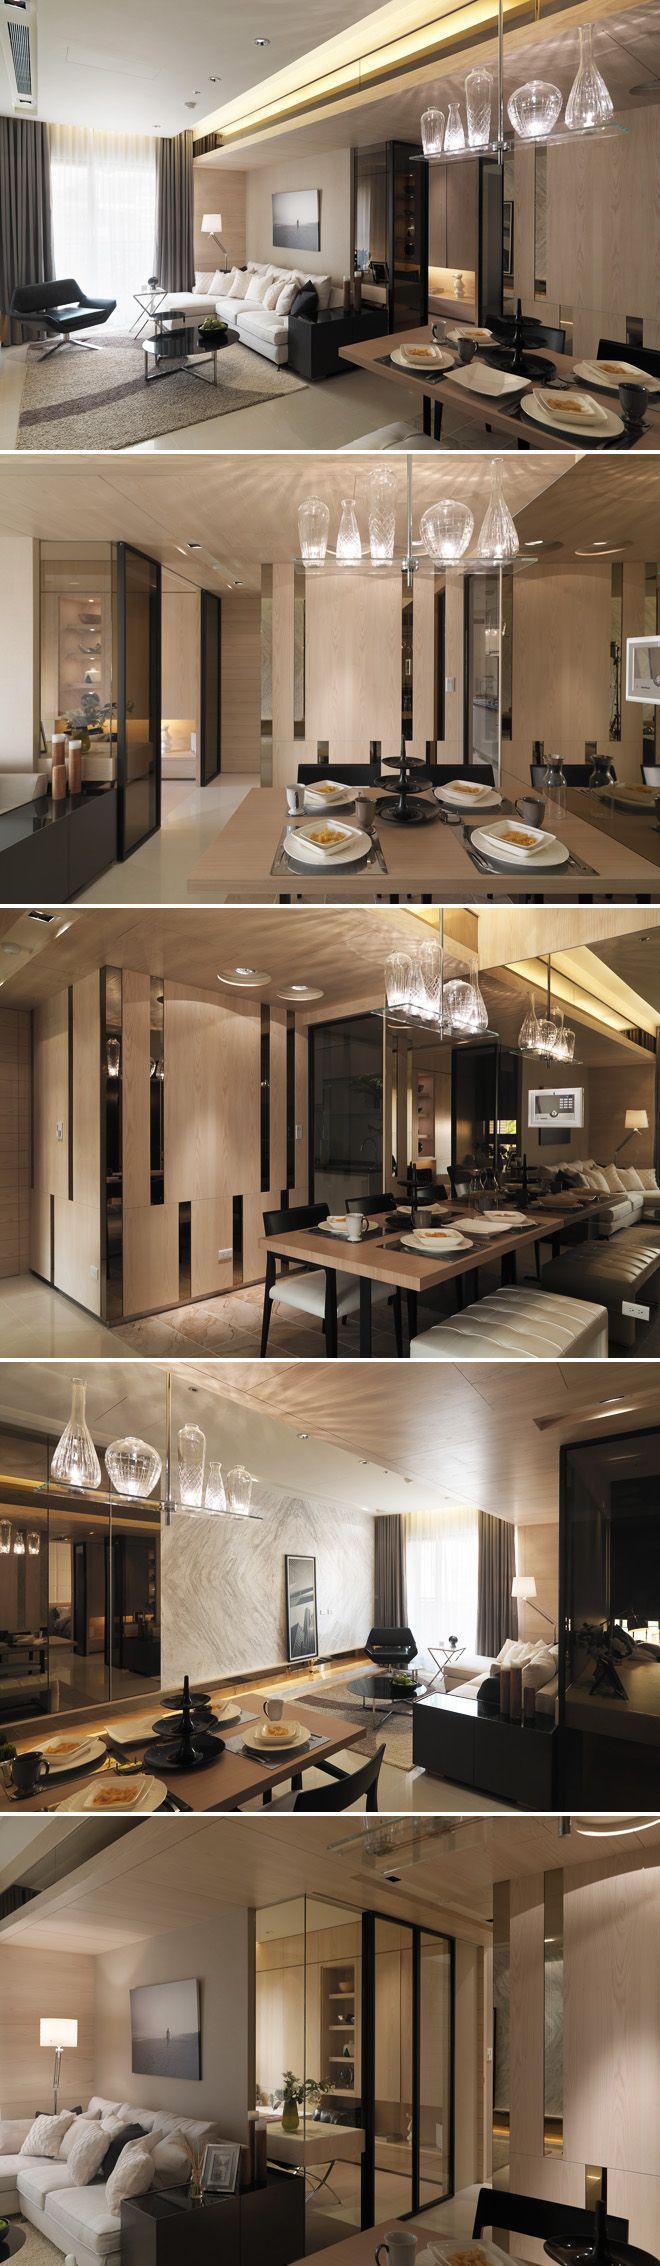 Contemporary Design + Architecture Interior by Fantasia interior| LBV ♥✤ | KeepSmiling | BeStayElegant